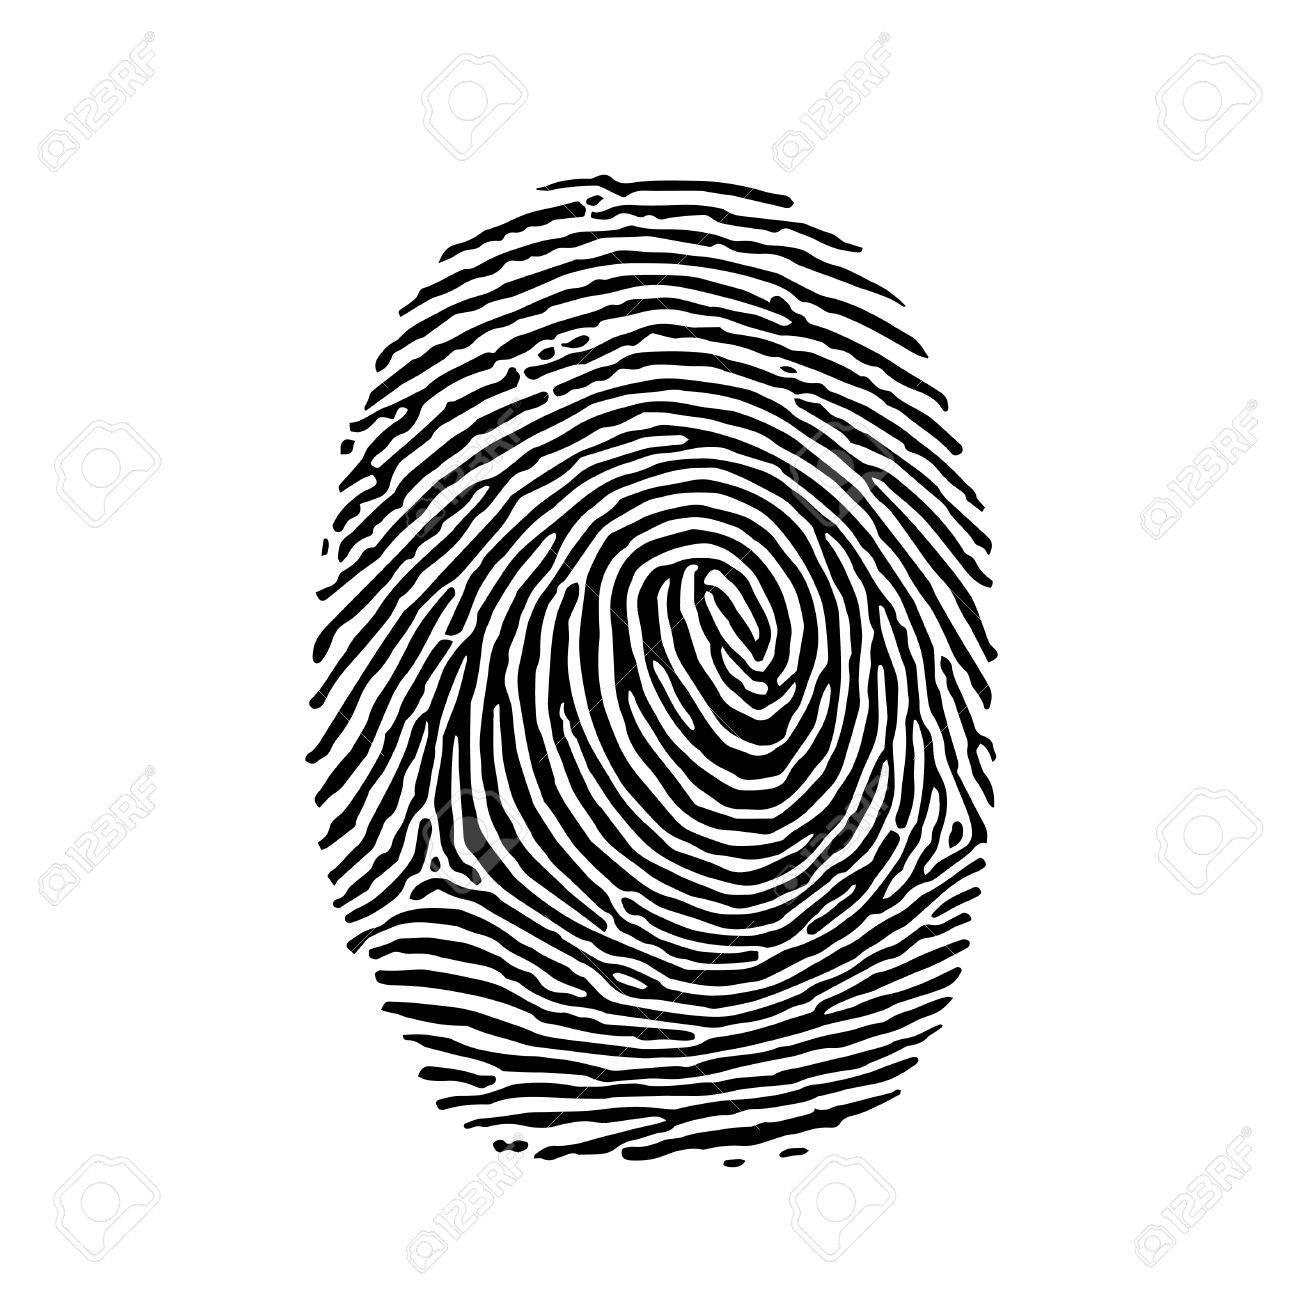 fingerprint vector royalty free cliparts vectors and stock rh 123rf com fingerprinting victoria tx fingerprinting victorville